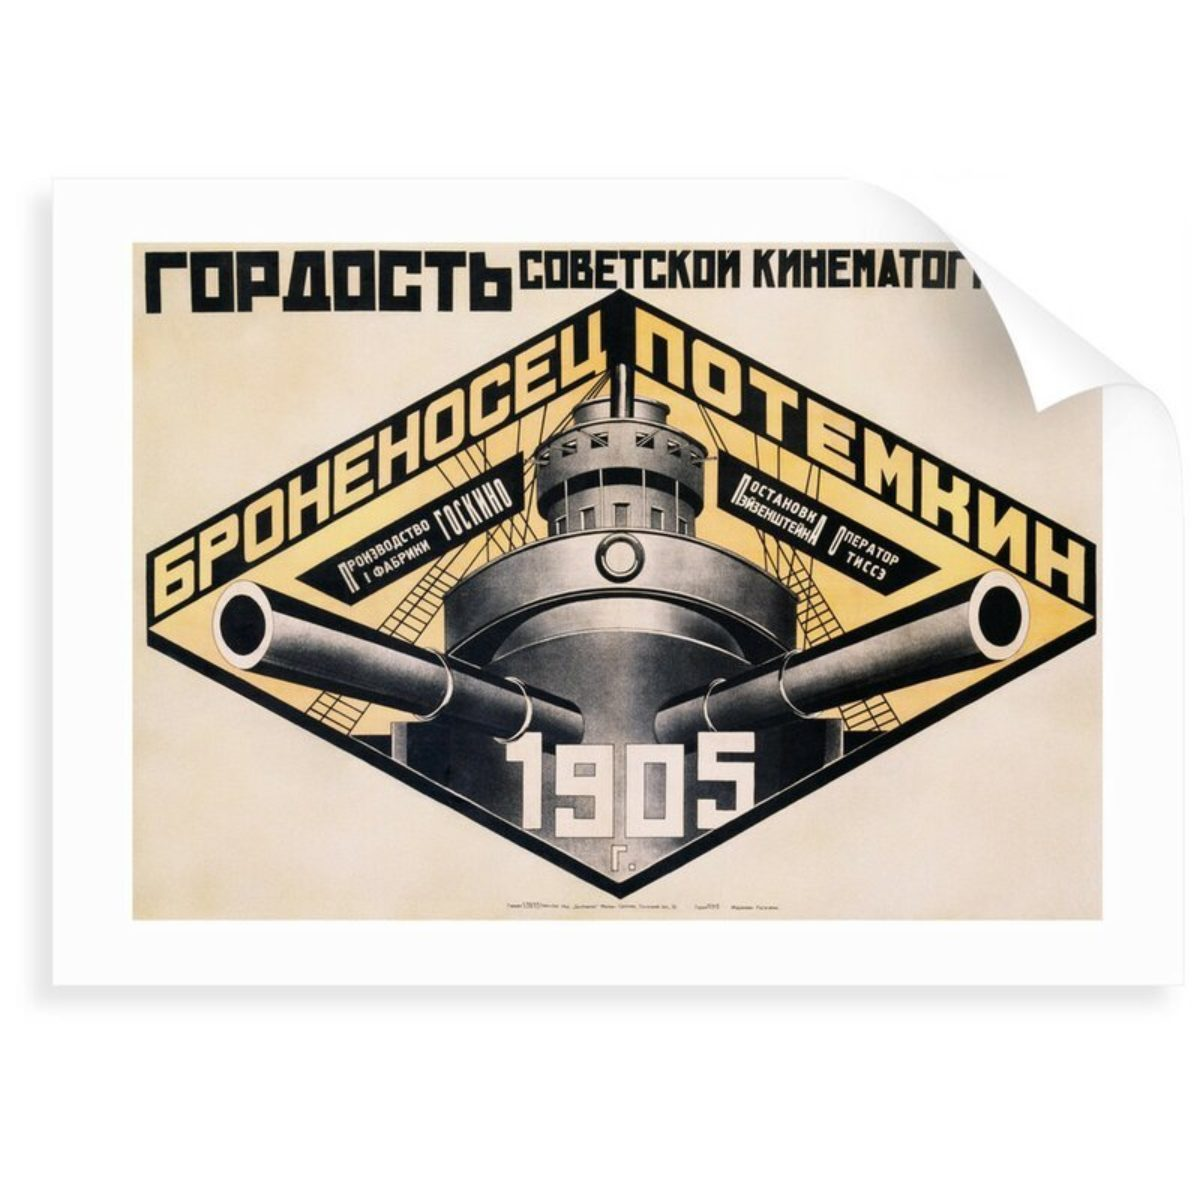 Battleship Potemkin1905 Posterby Alexander Rodchenko Advertisement